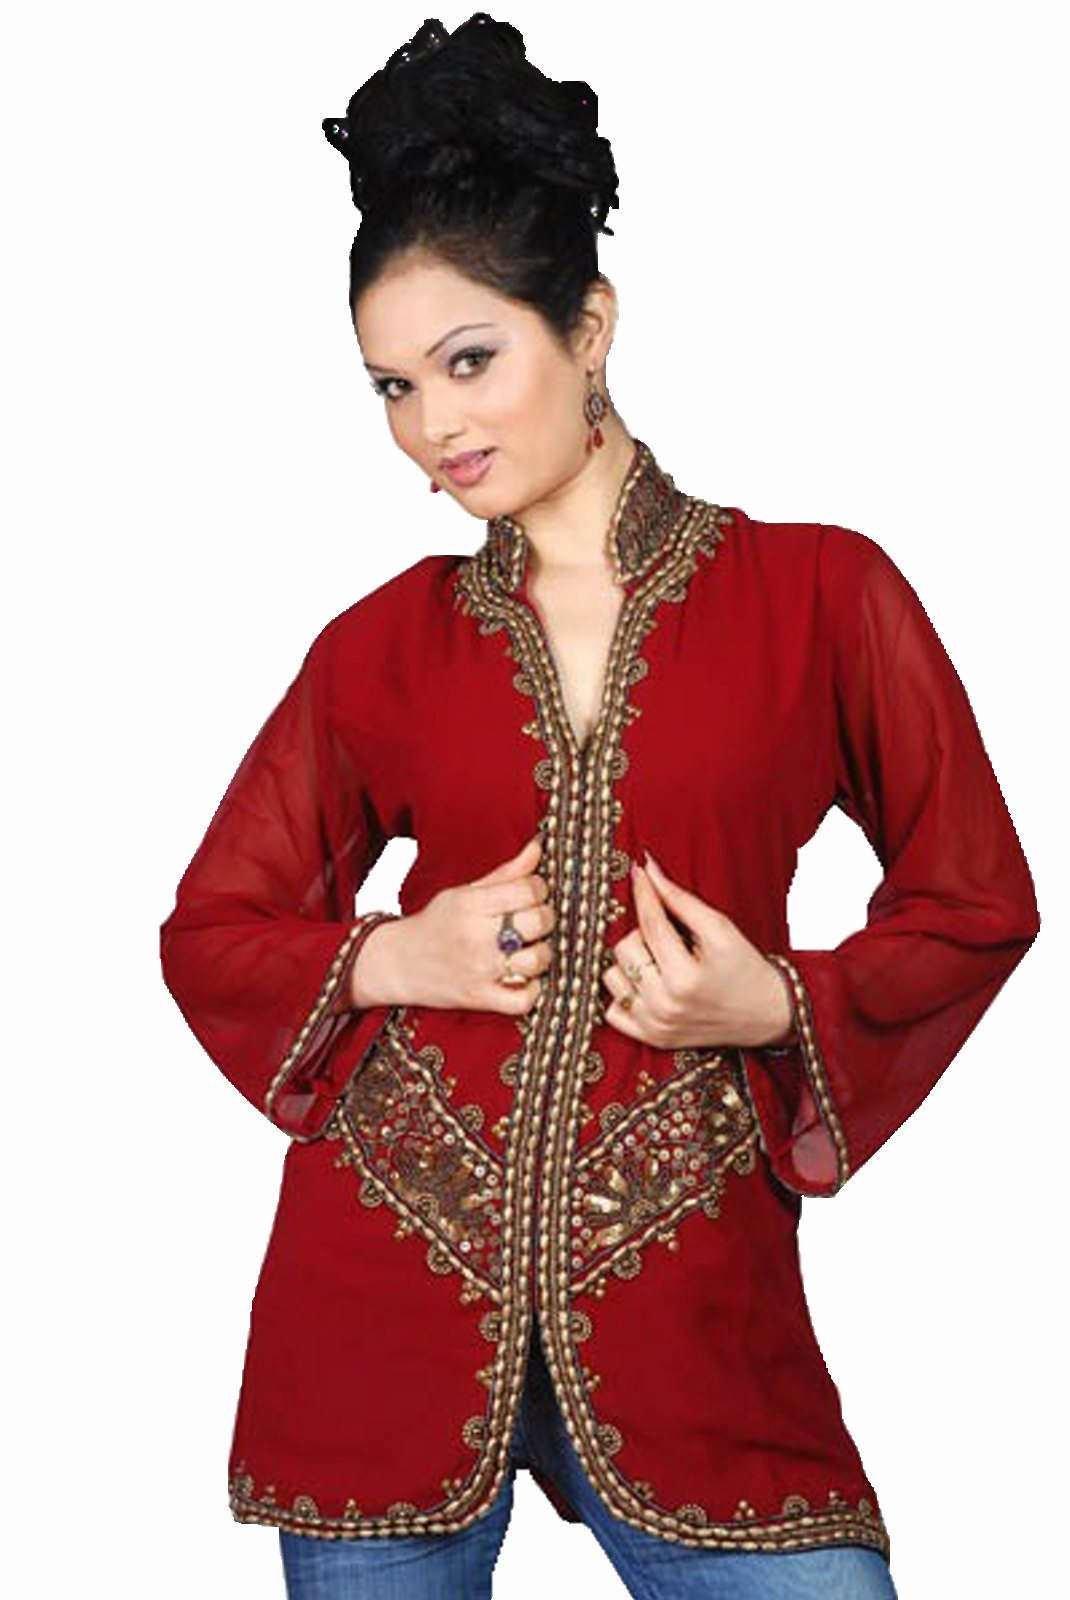 Indian Selections - Burgundy long sleeves Kurti/Tunic with jacket style beadwork - X-Large